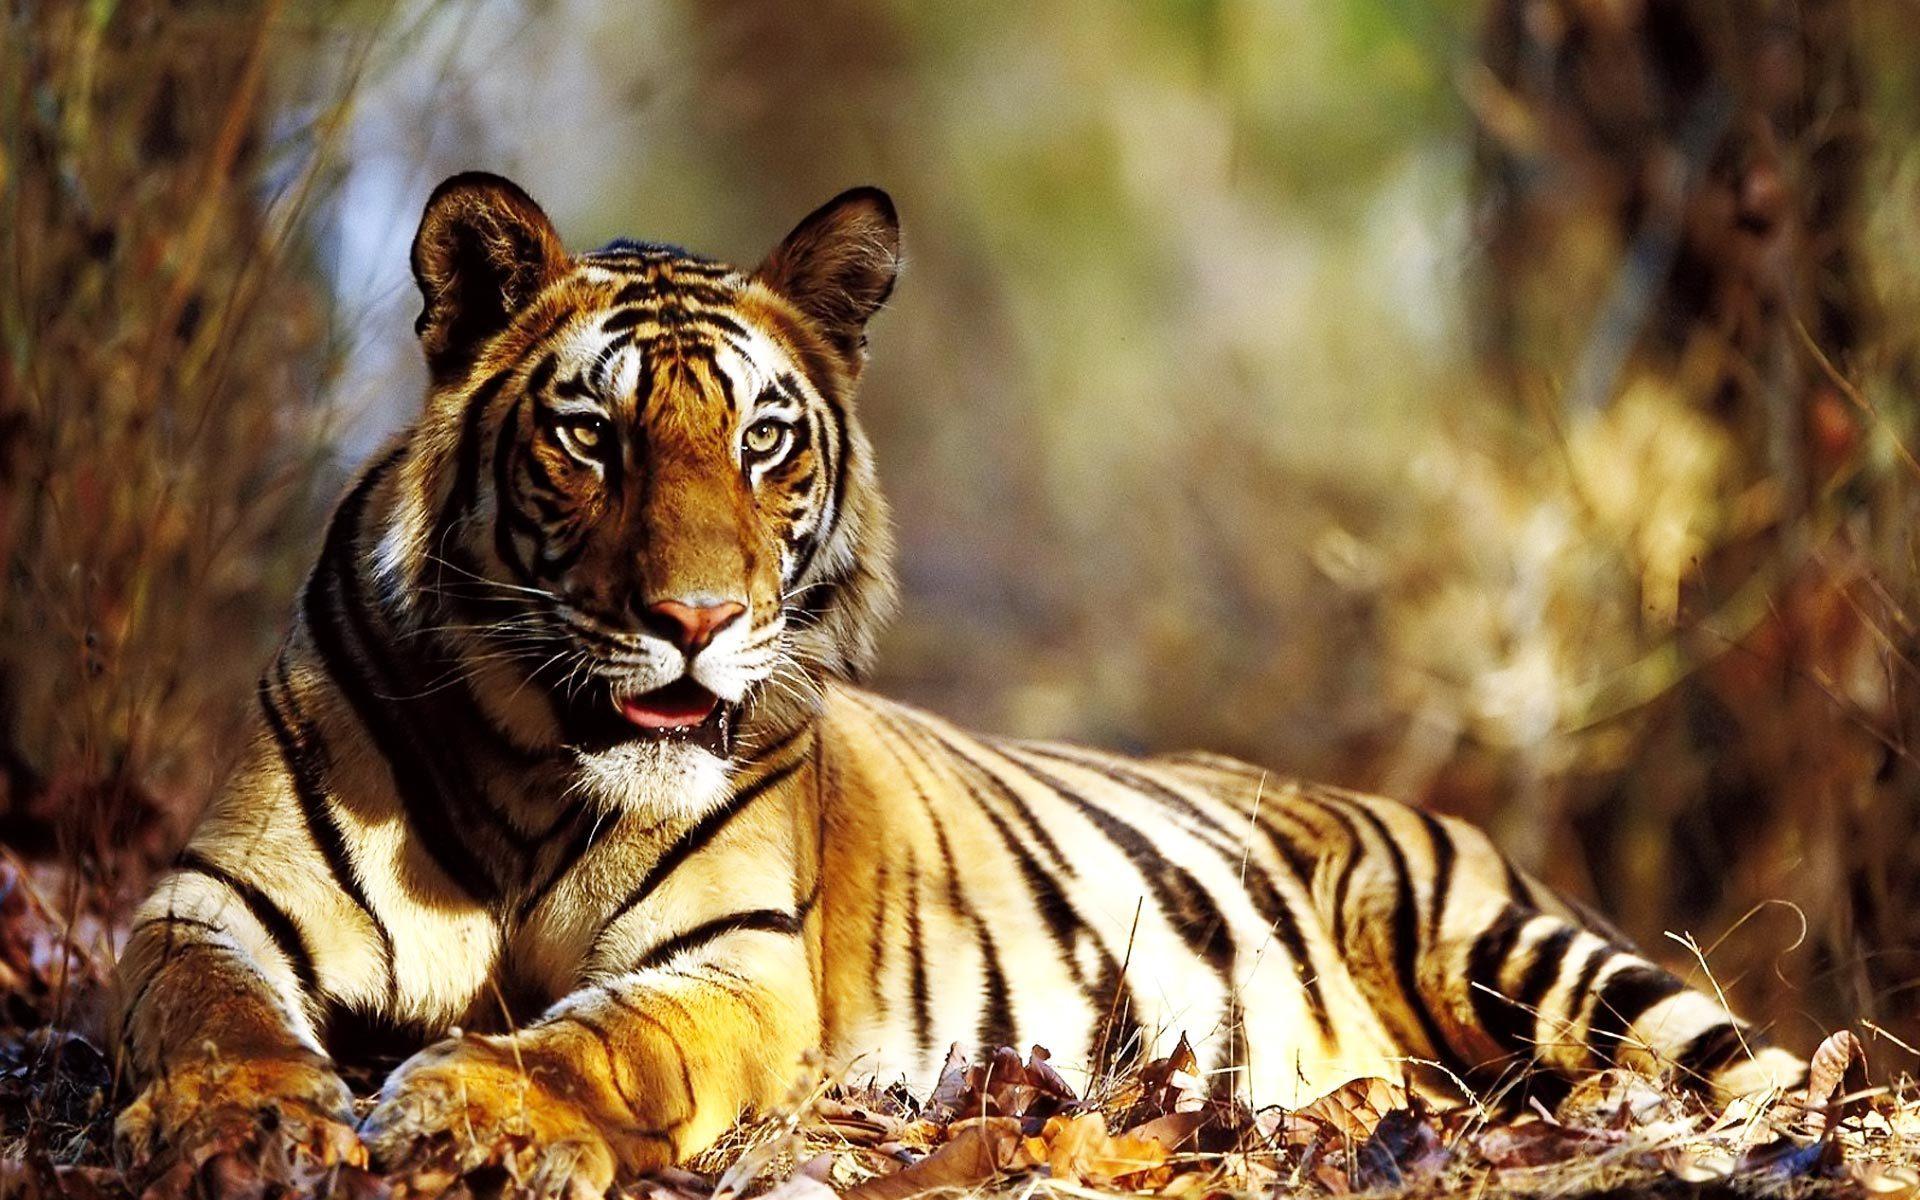 Siberian Tiger Mac Amazing HD Wallpaper Wallpaper Tiger 1103 high 1920x1200